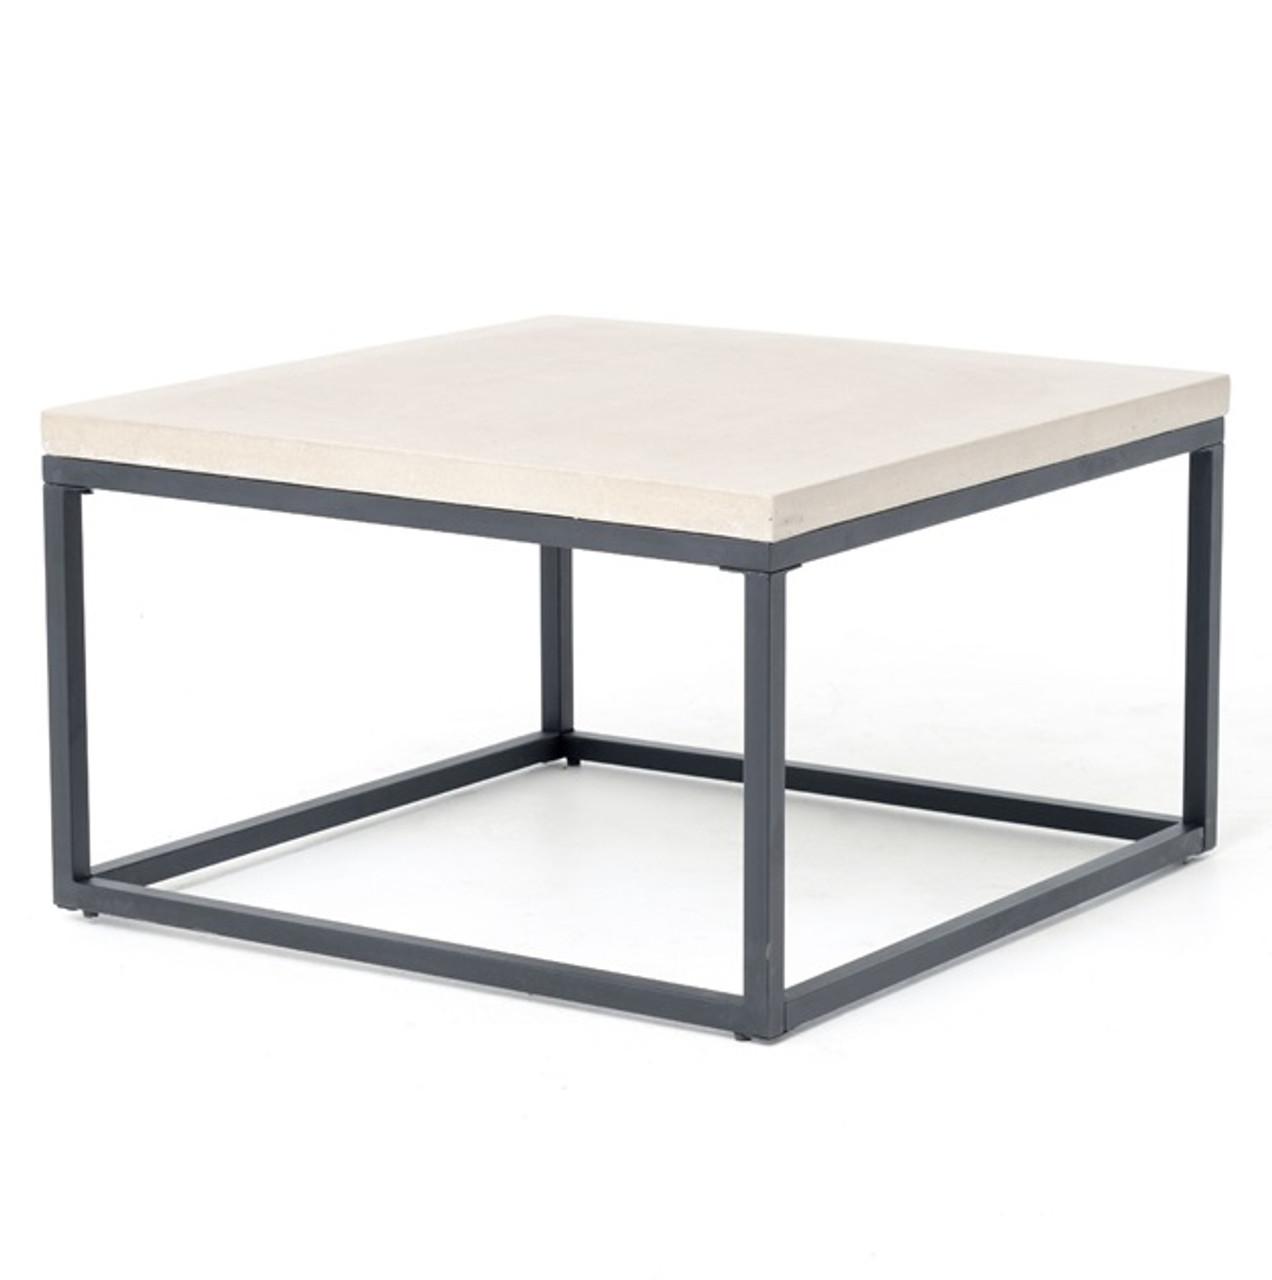 Masonry Concrete Box Frame Square Coffee Table Zin Home